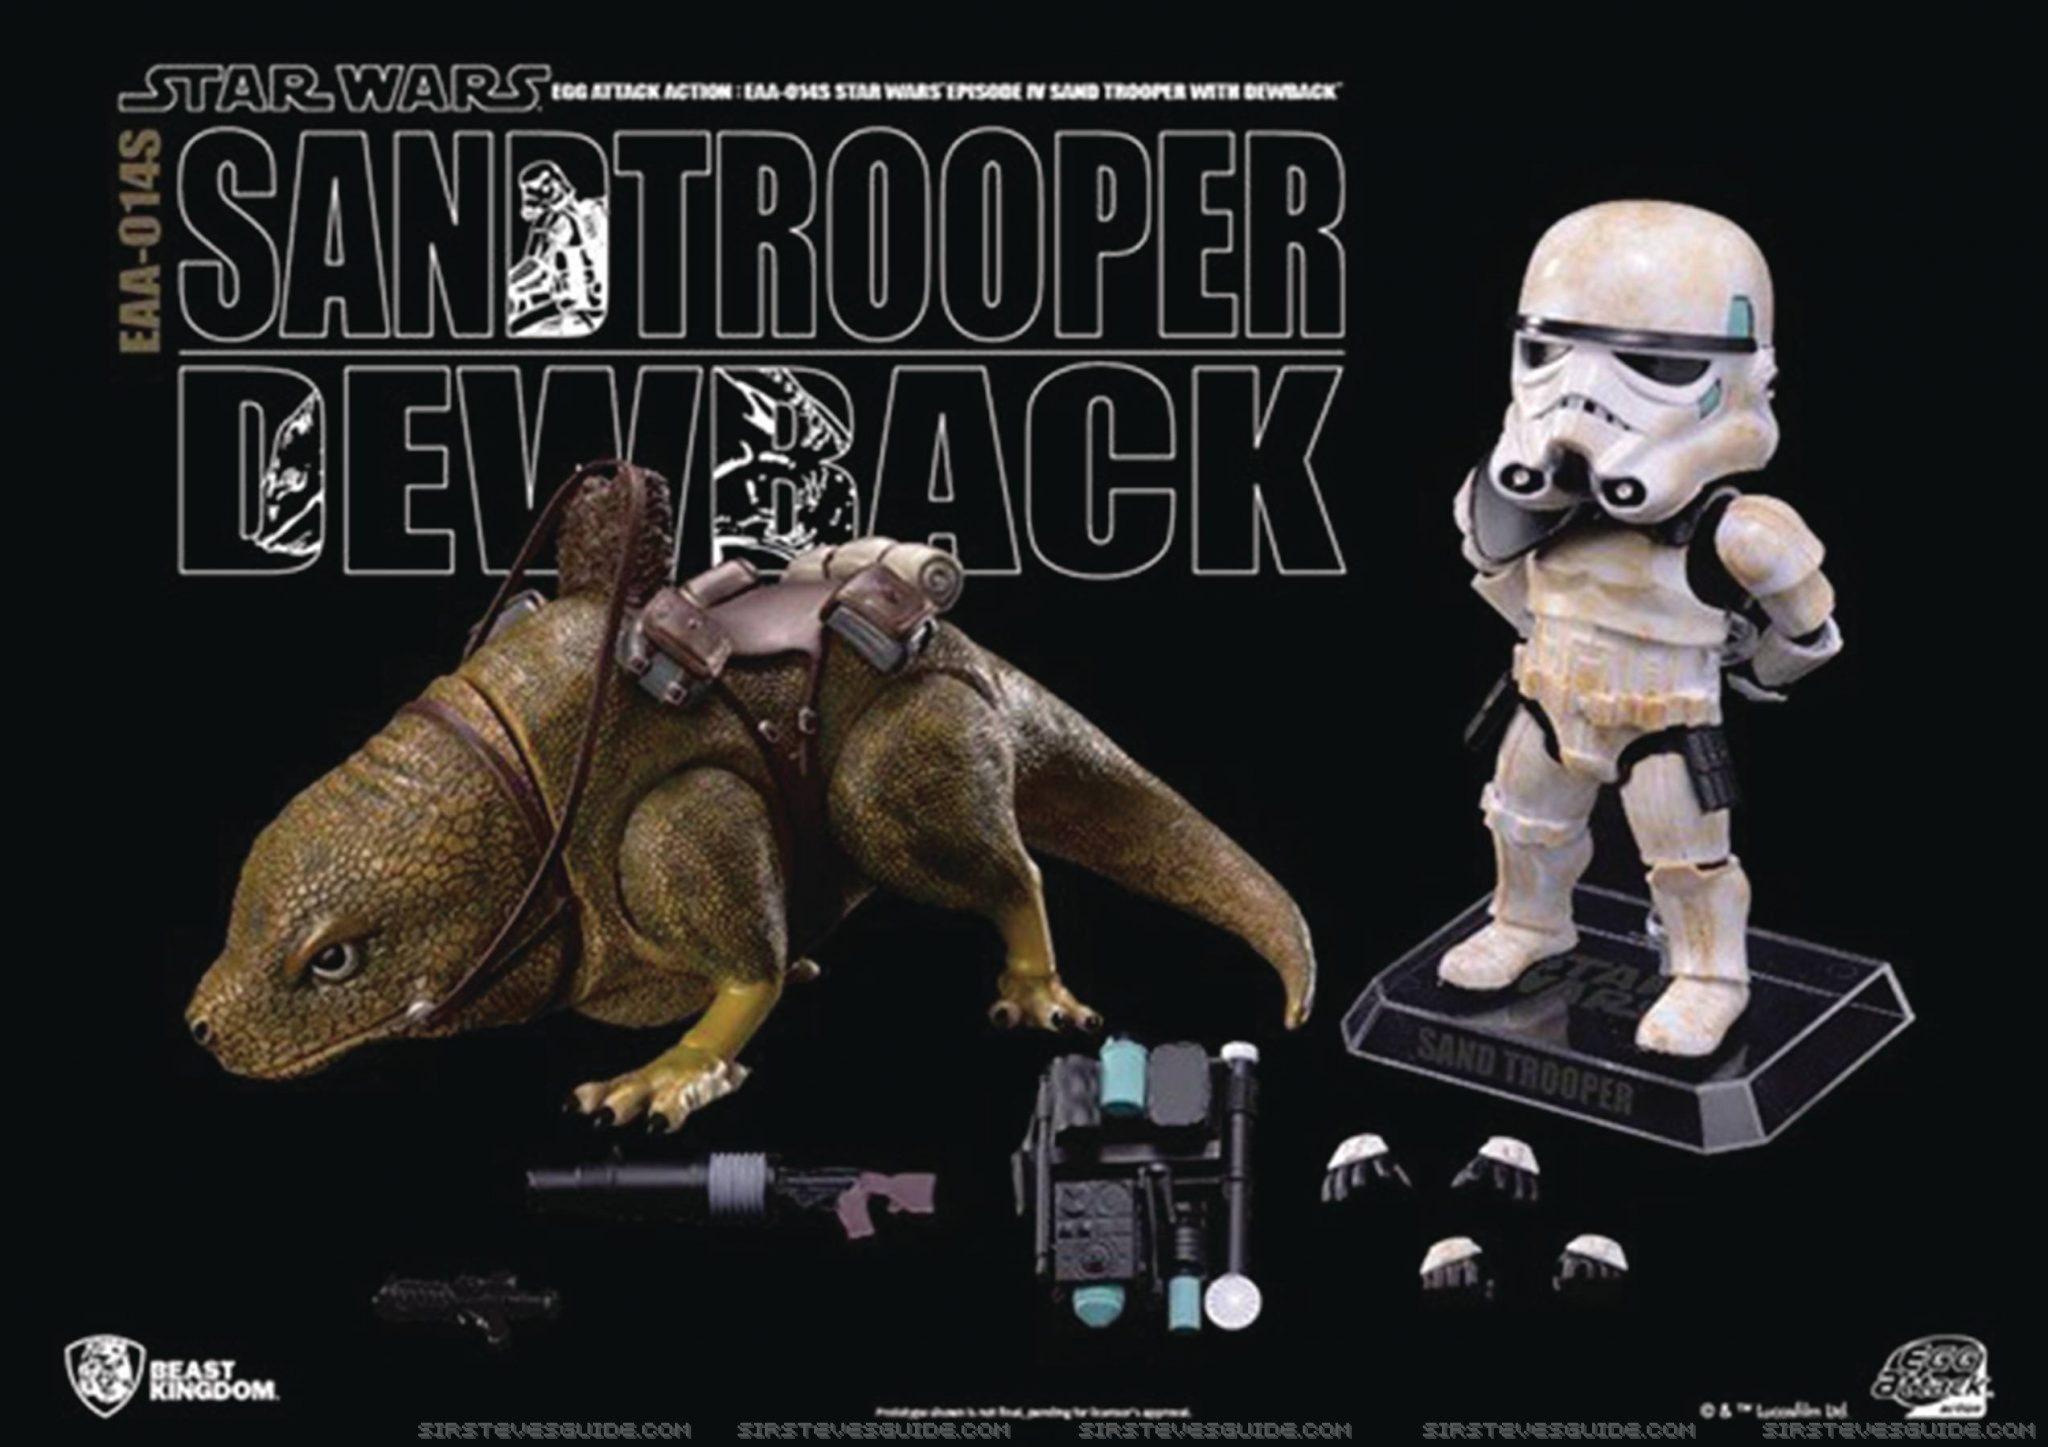 Diamond Select Toys Star Wars Dewback & Sandtrooper